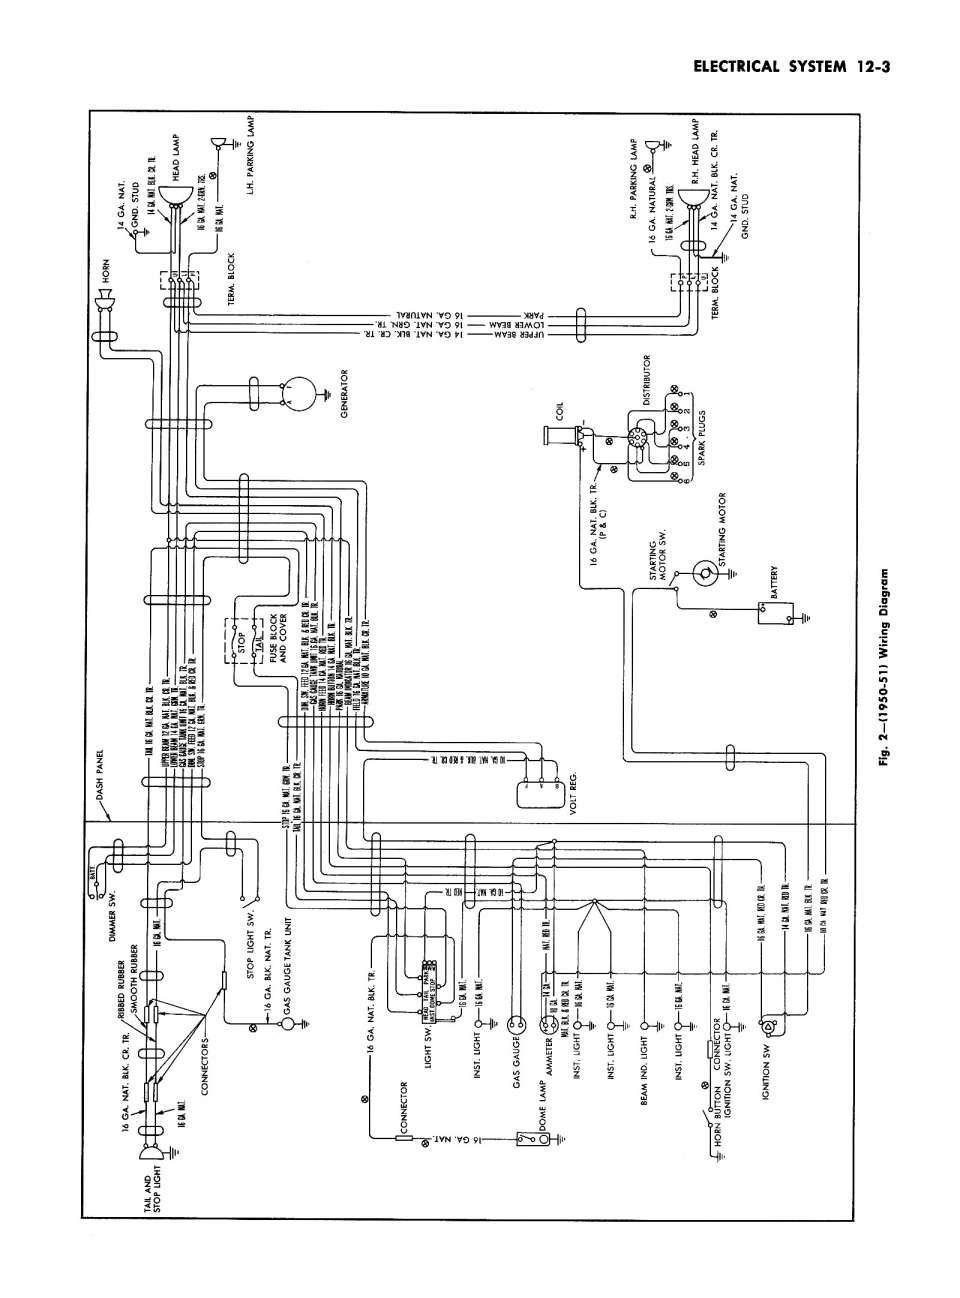 12+ Gauges Wiring Diagram 1951 Chevy Car - Car Diagram - Wiringg.net in  2020 | Chevy trucks, 1966 chevy truck, TrucksPinterest